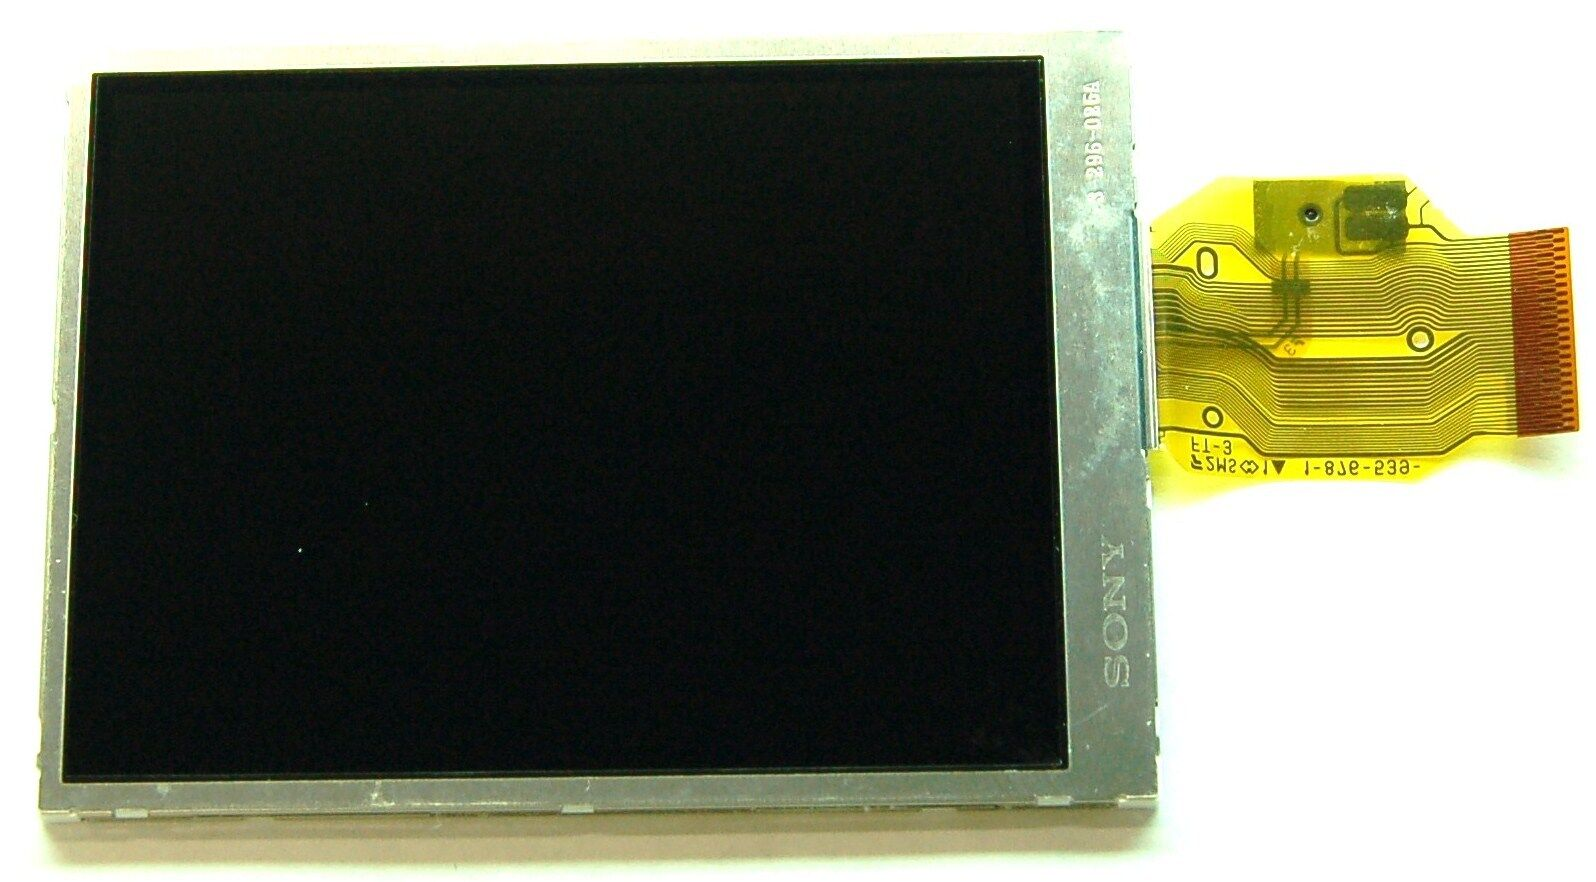 Lcd Display Screen For Fuji Fujifilm Hs20 Hs22 Hs25 Hs28 ...